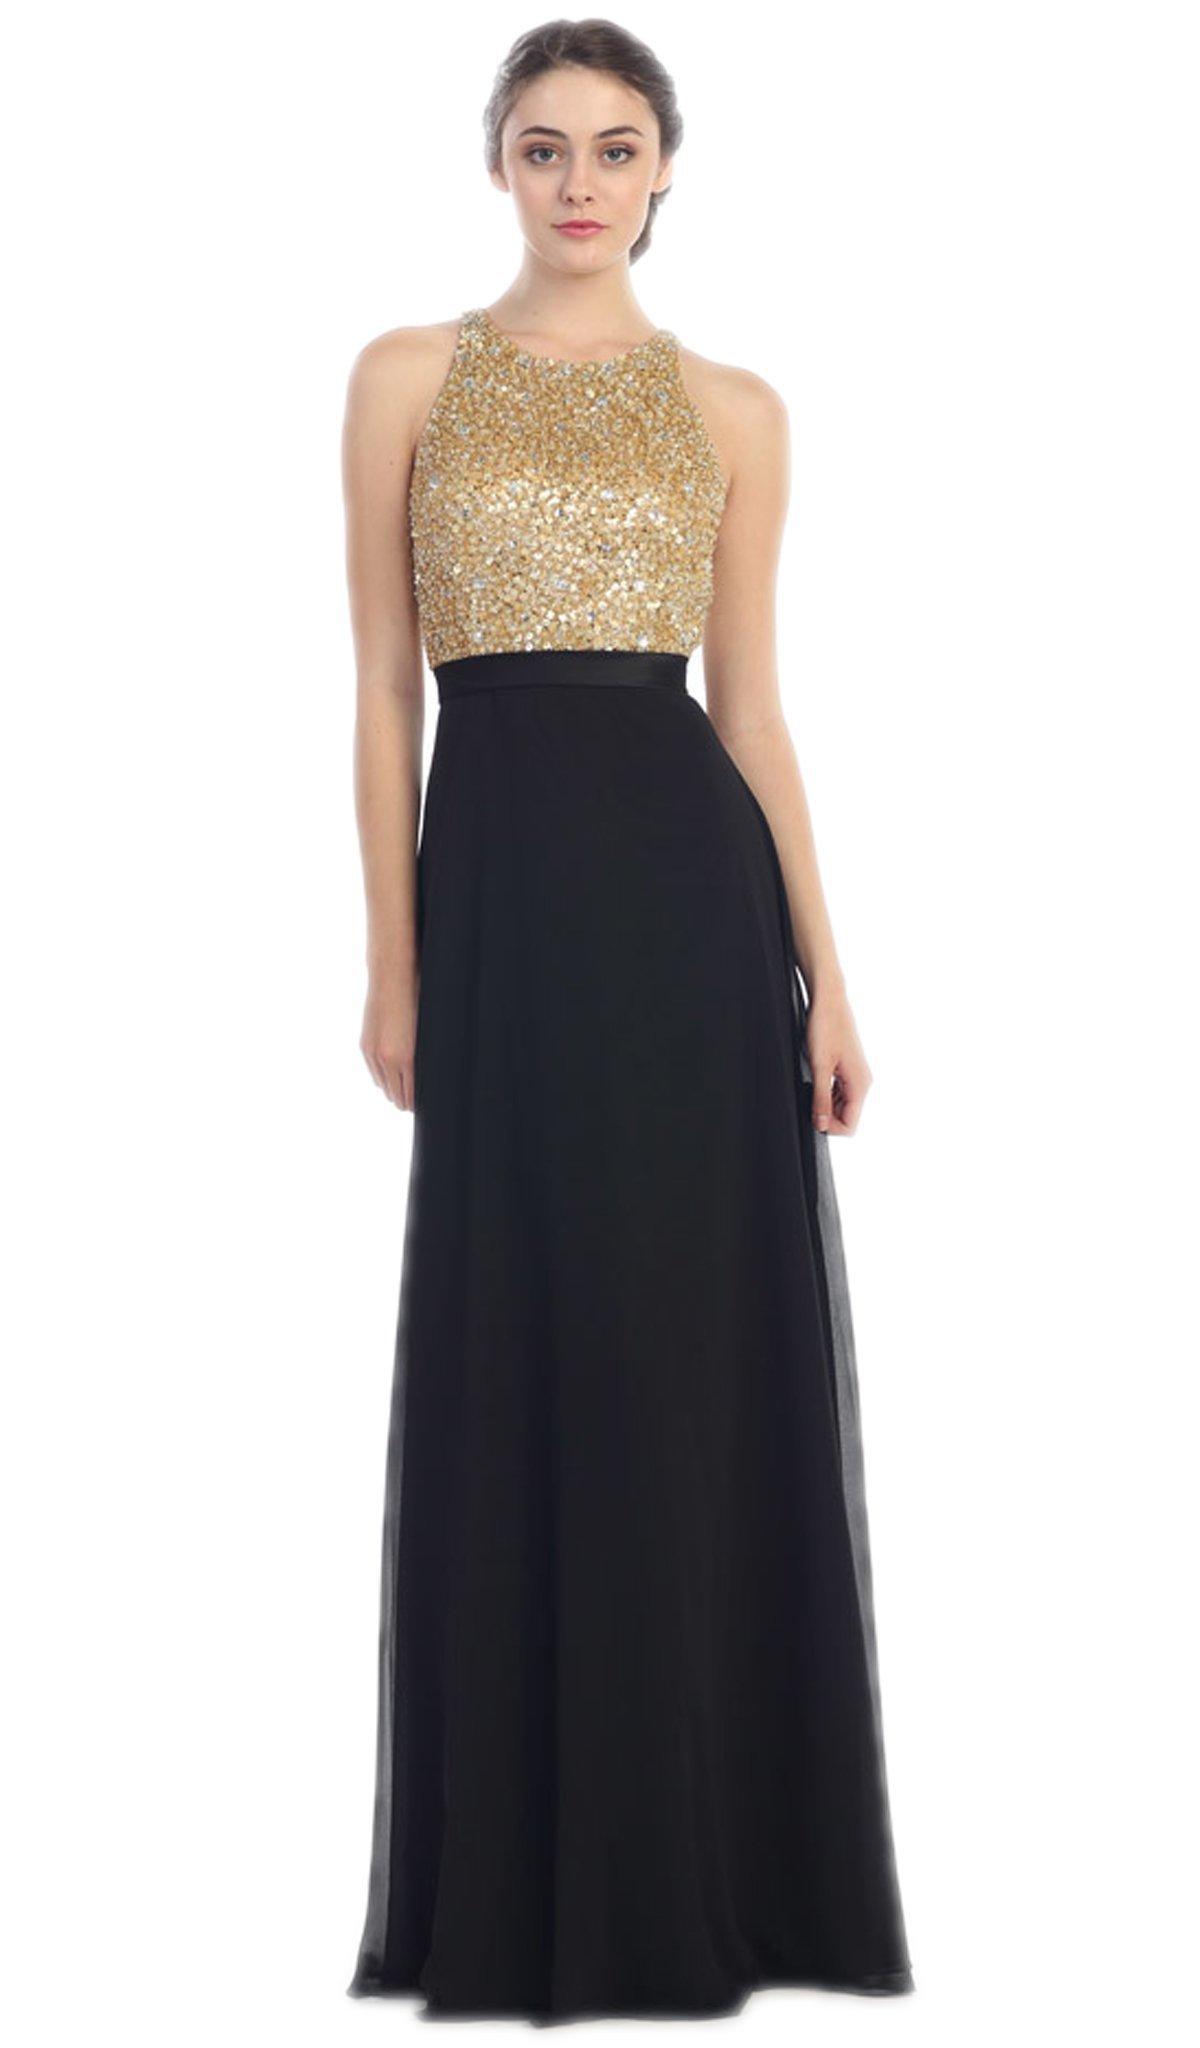 Eureka Fashion - Sleeveless Metallic Sequined Chiffon A-Line Evening Gown